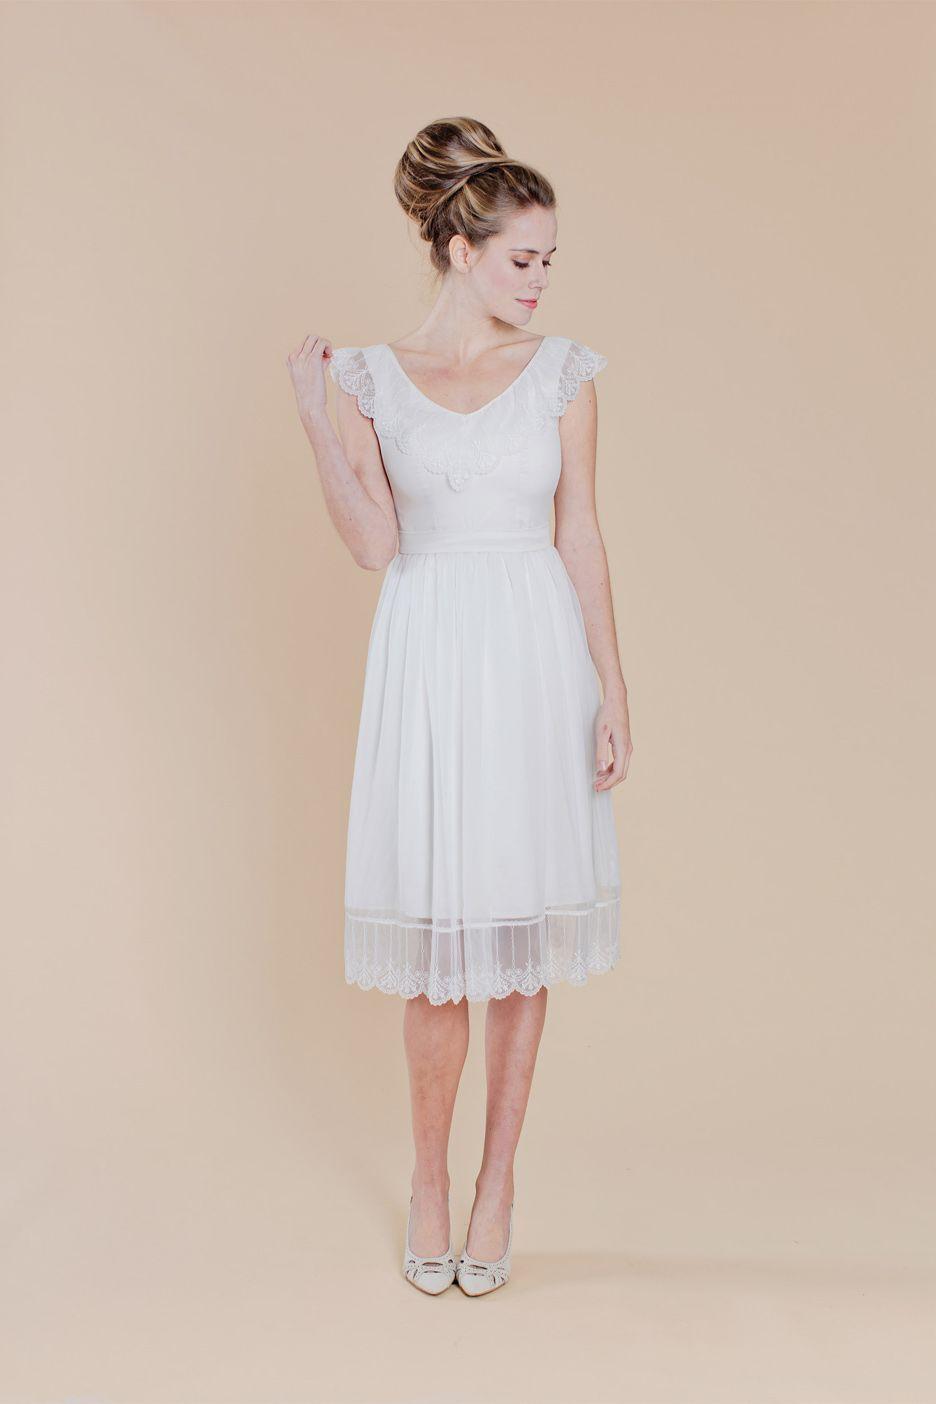 Sweetpea wedding dress from nz designer sally eagle bridalus